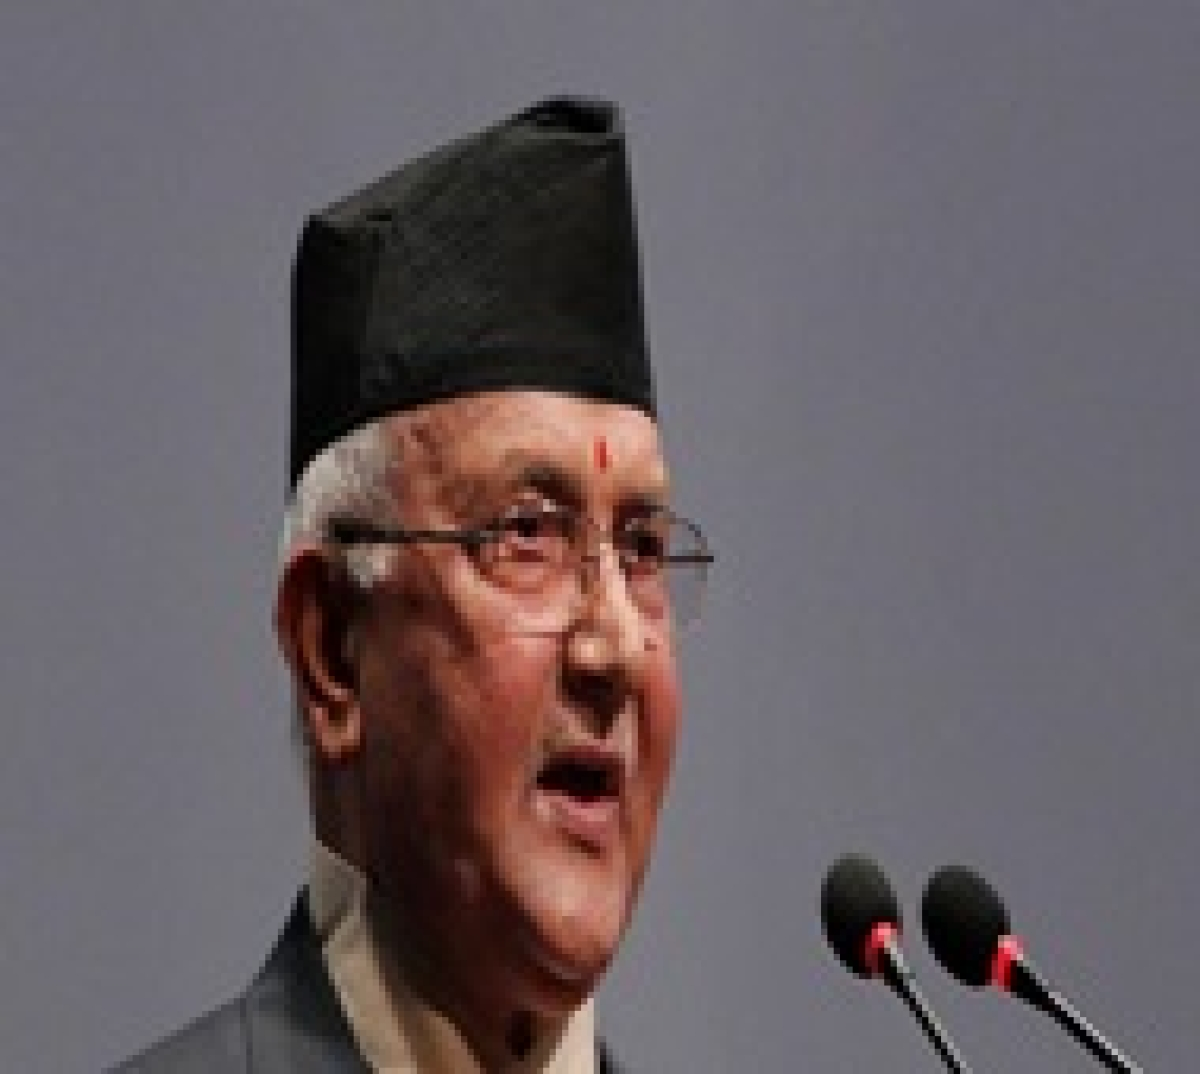 Nepal urged to act speedily on Terai abuses